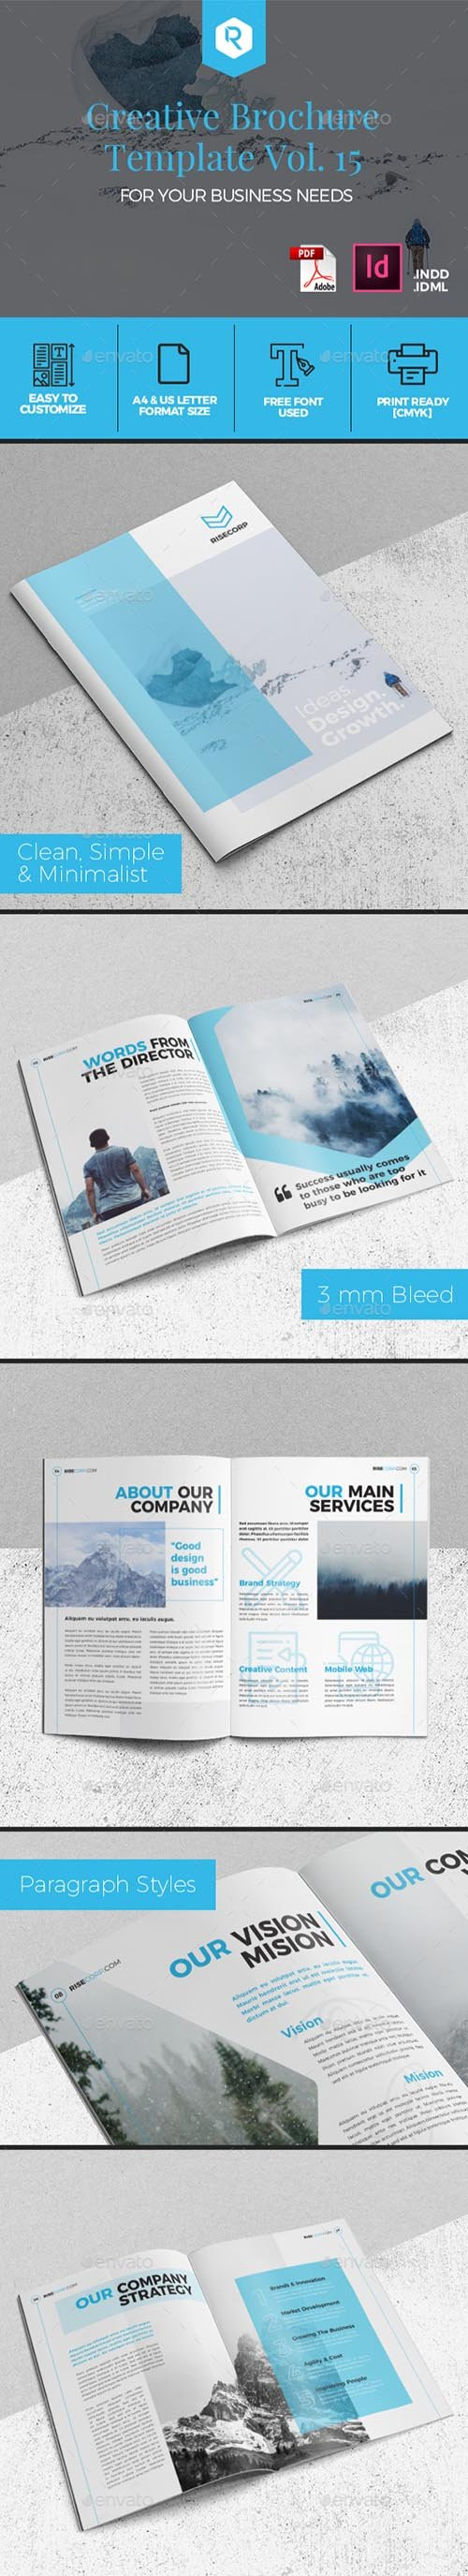 GR - Creative Brochure Template Vol. 15 20007529